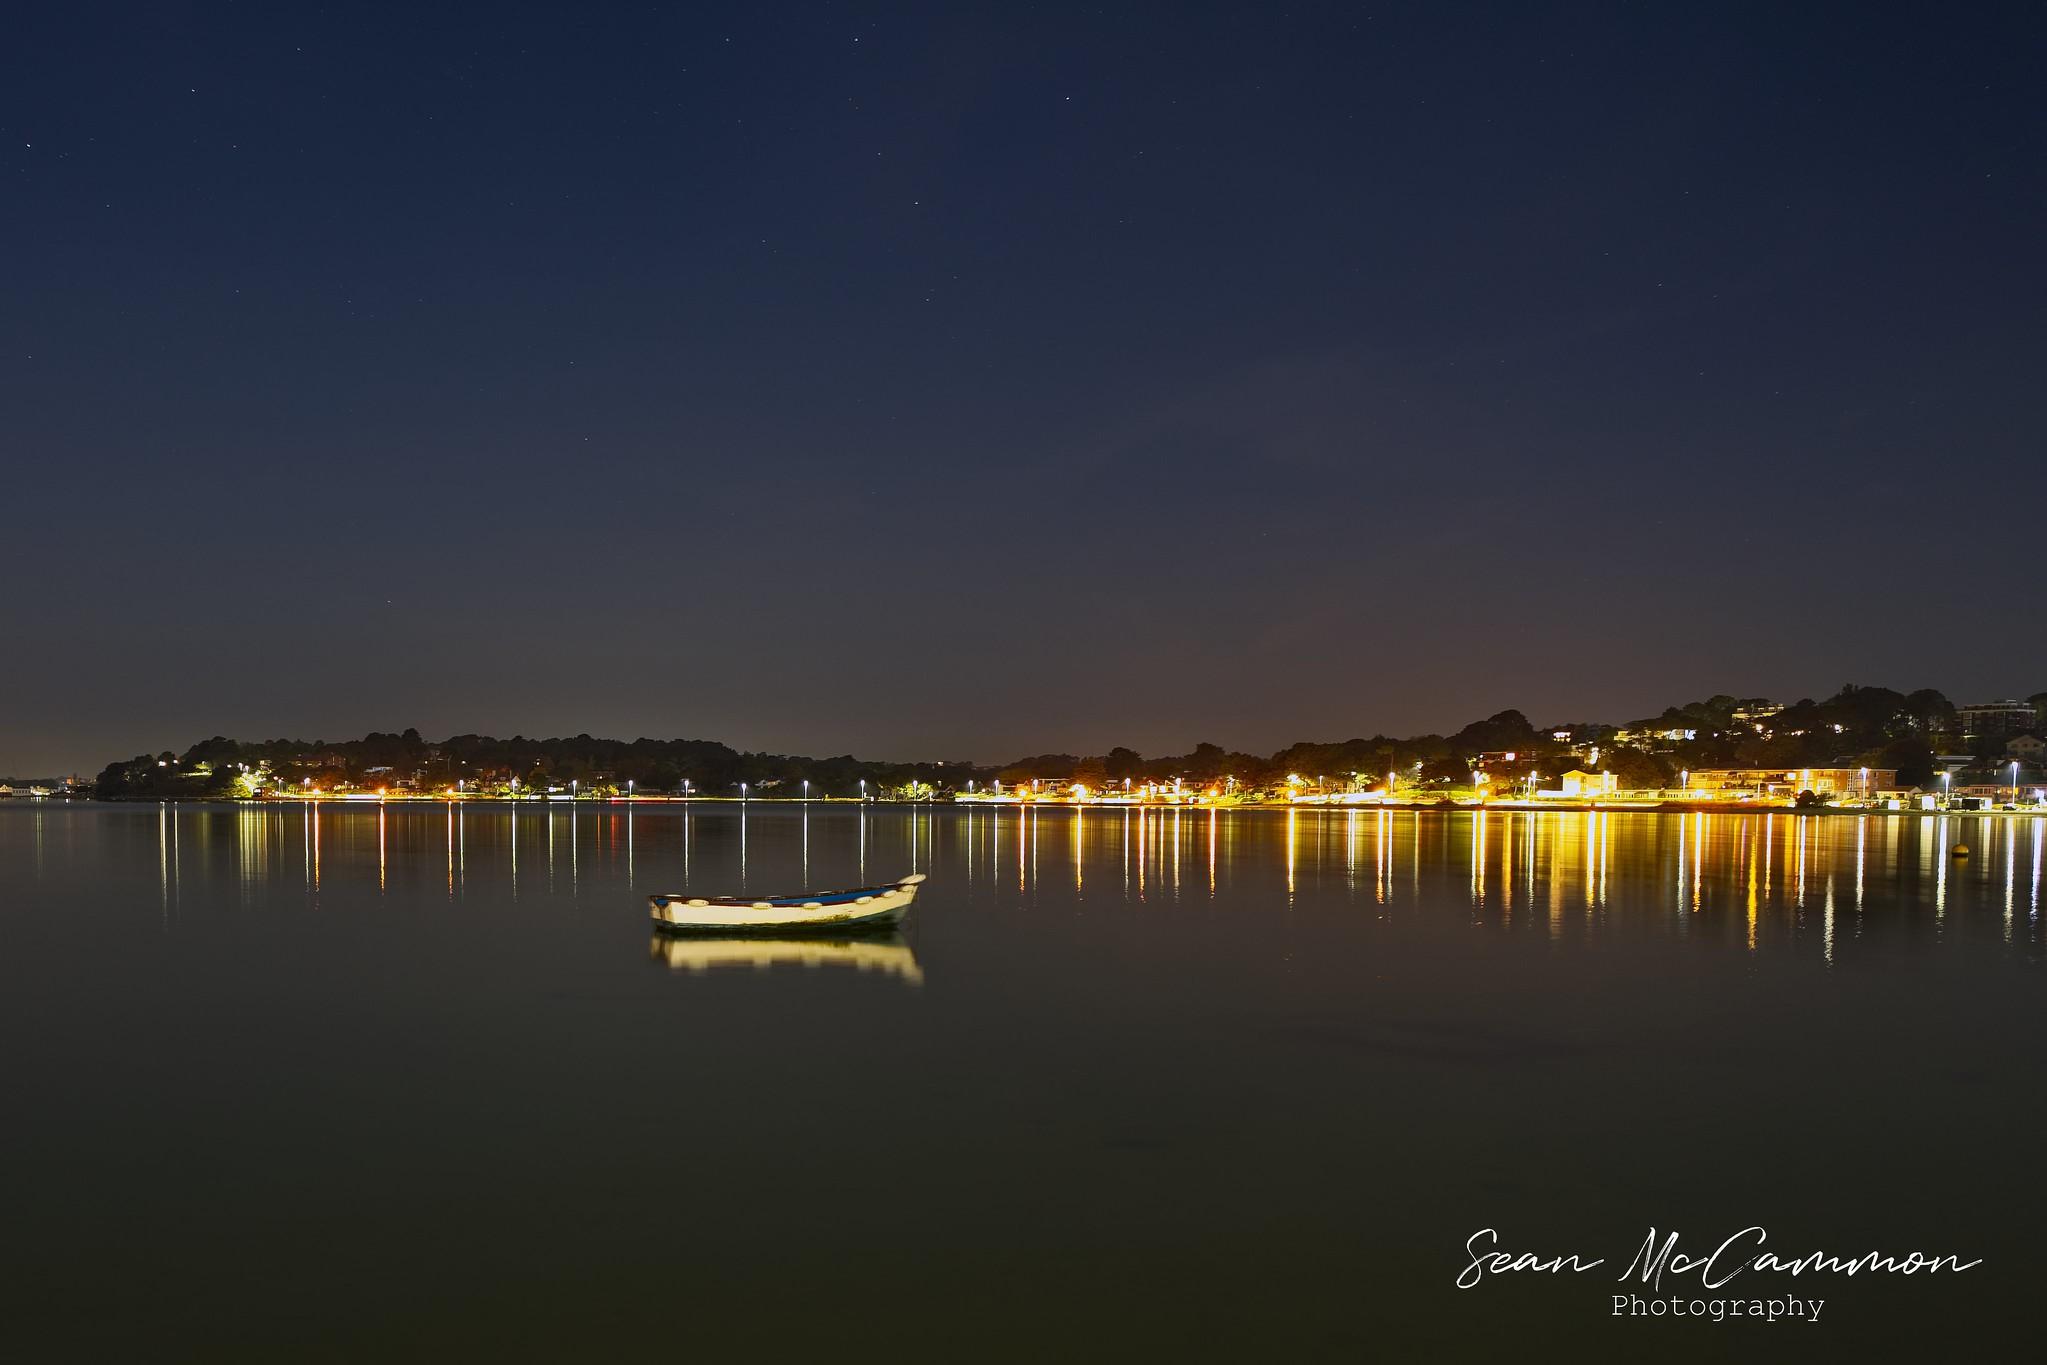 Boat at night in Sandbanks Bay